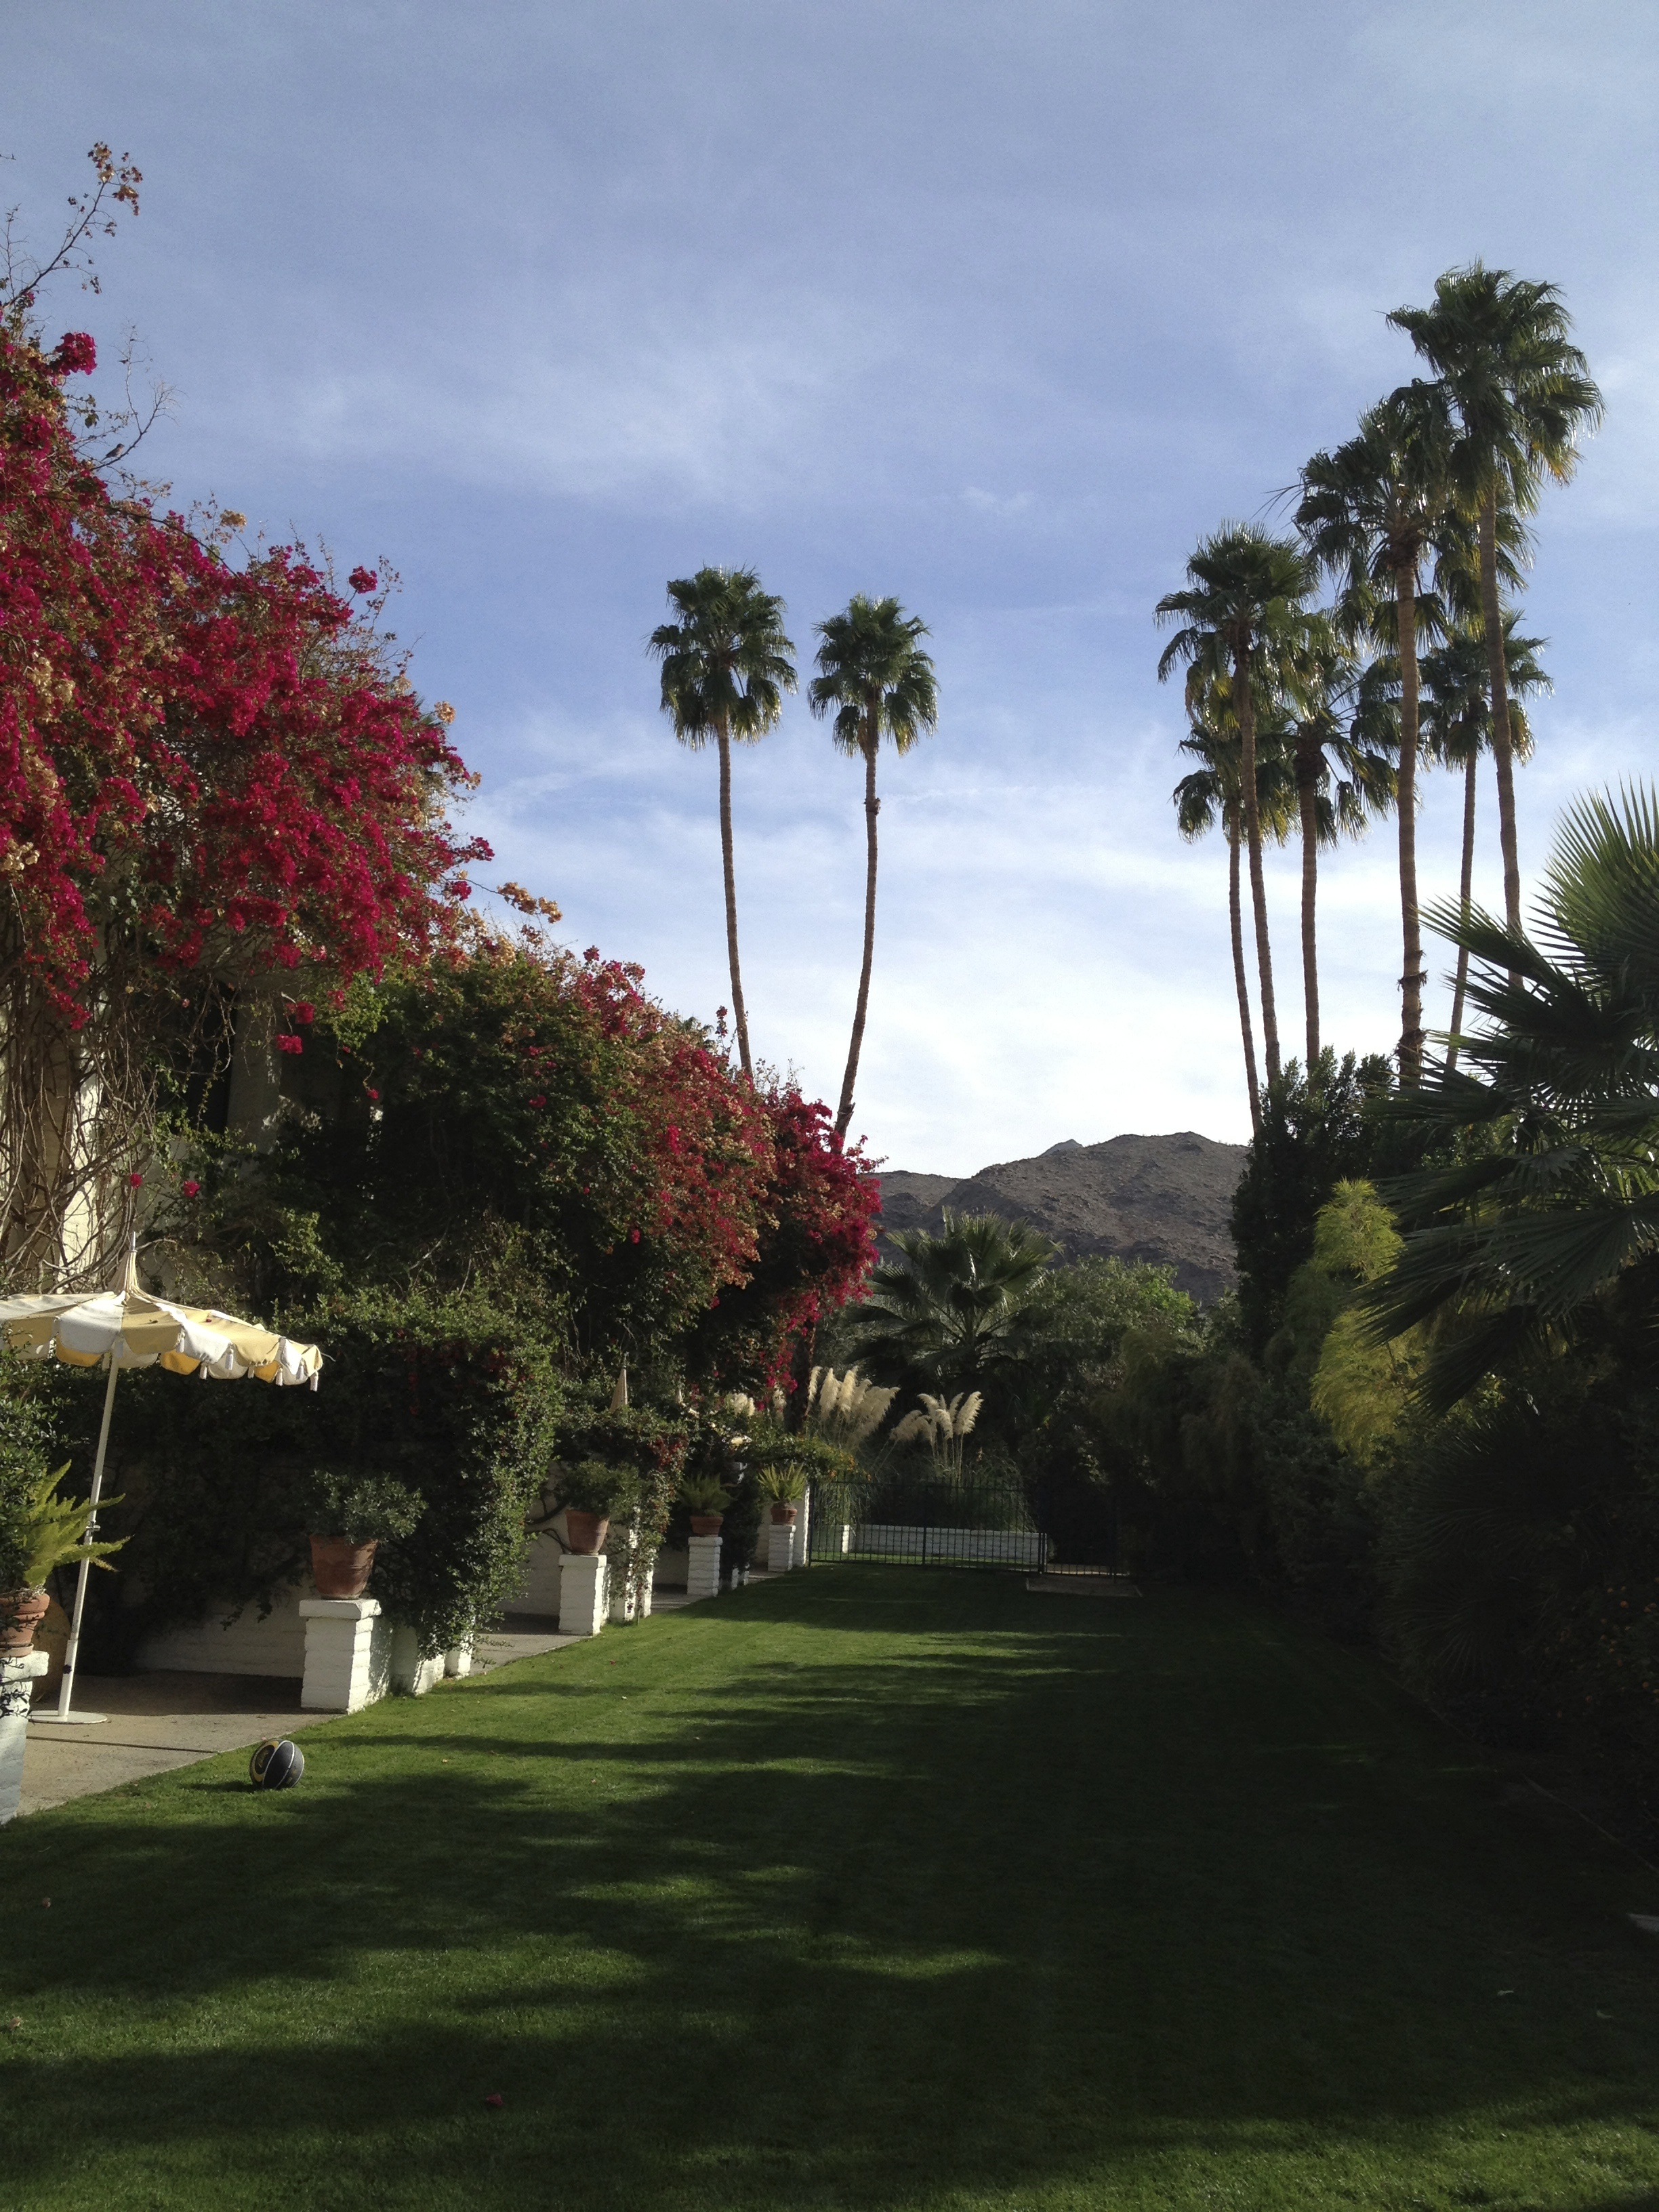 Parker Palm Springs CELLOPHANELAND - Palm springs escort reviews